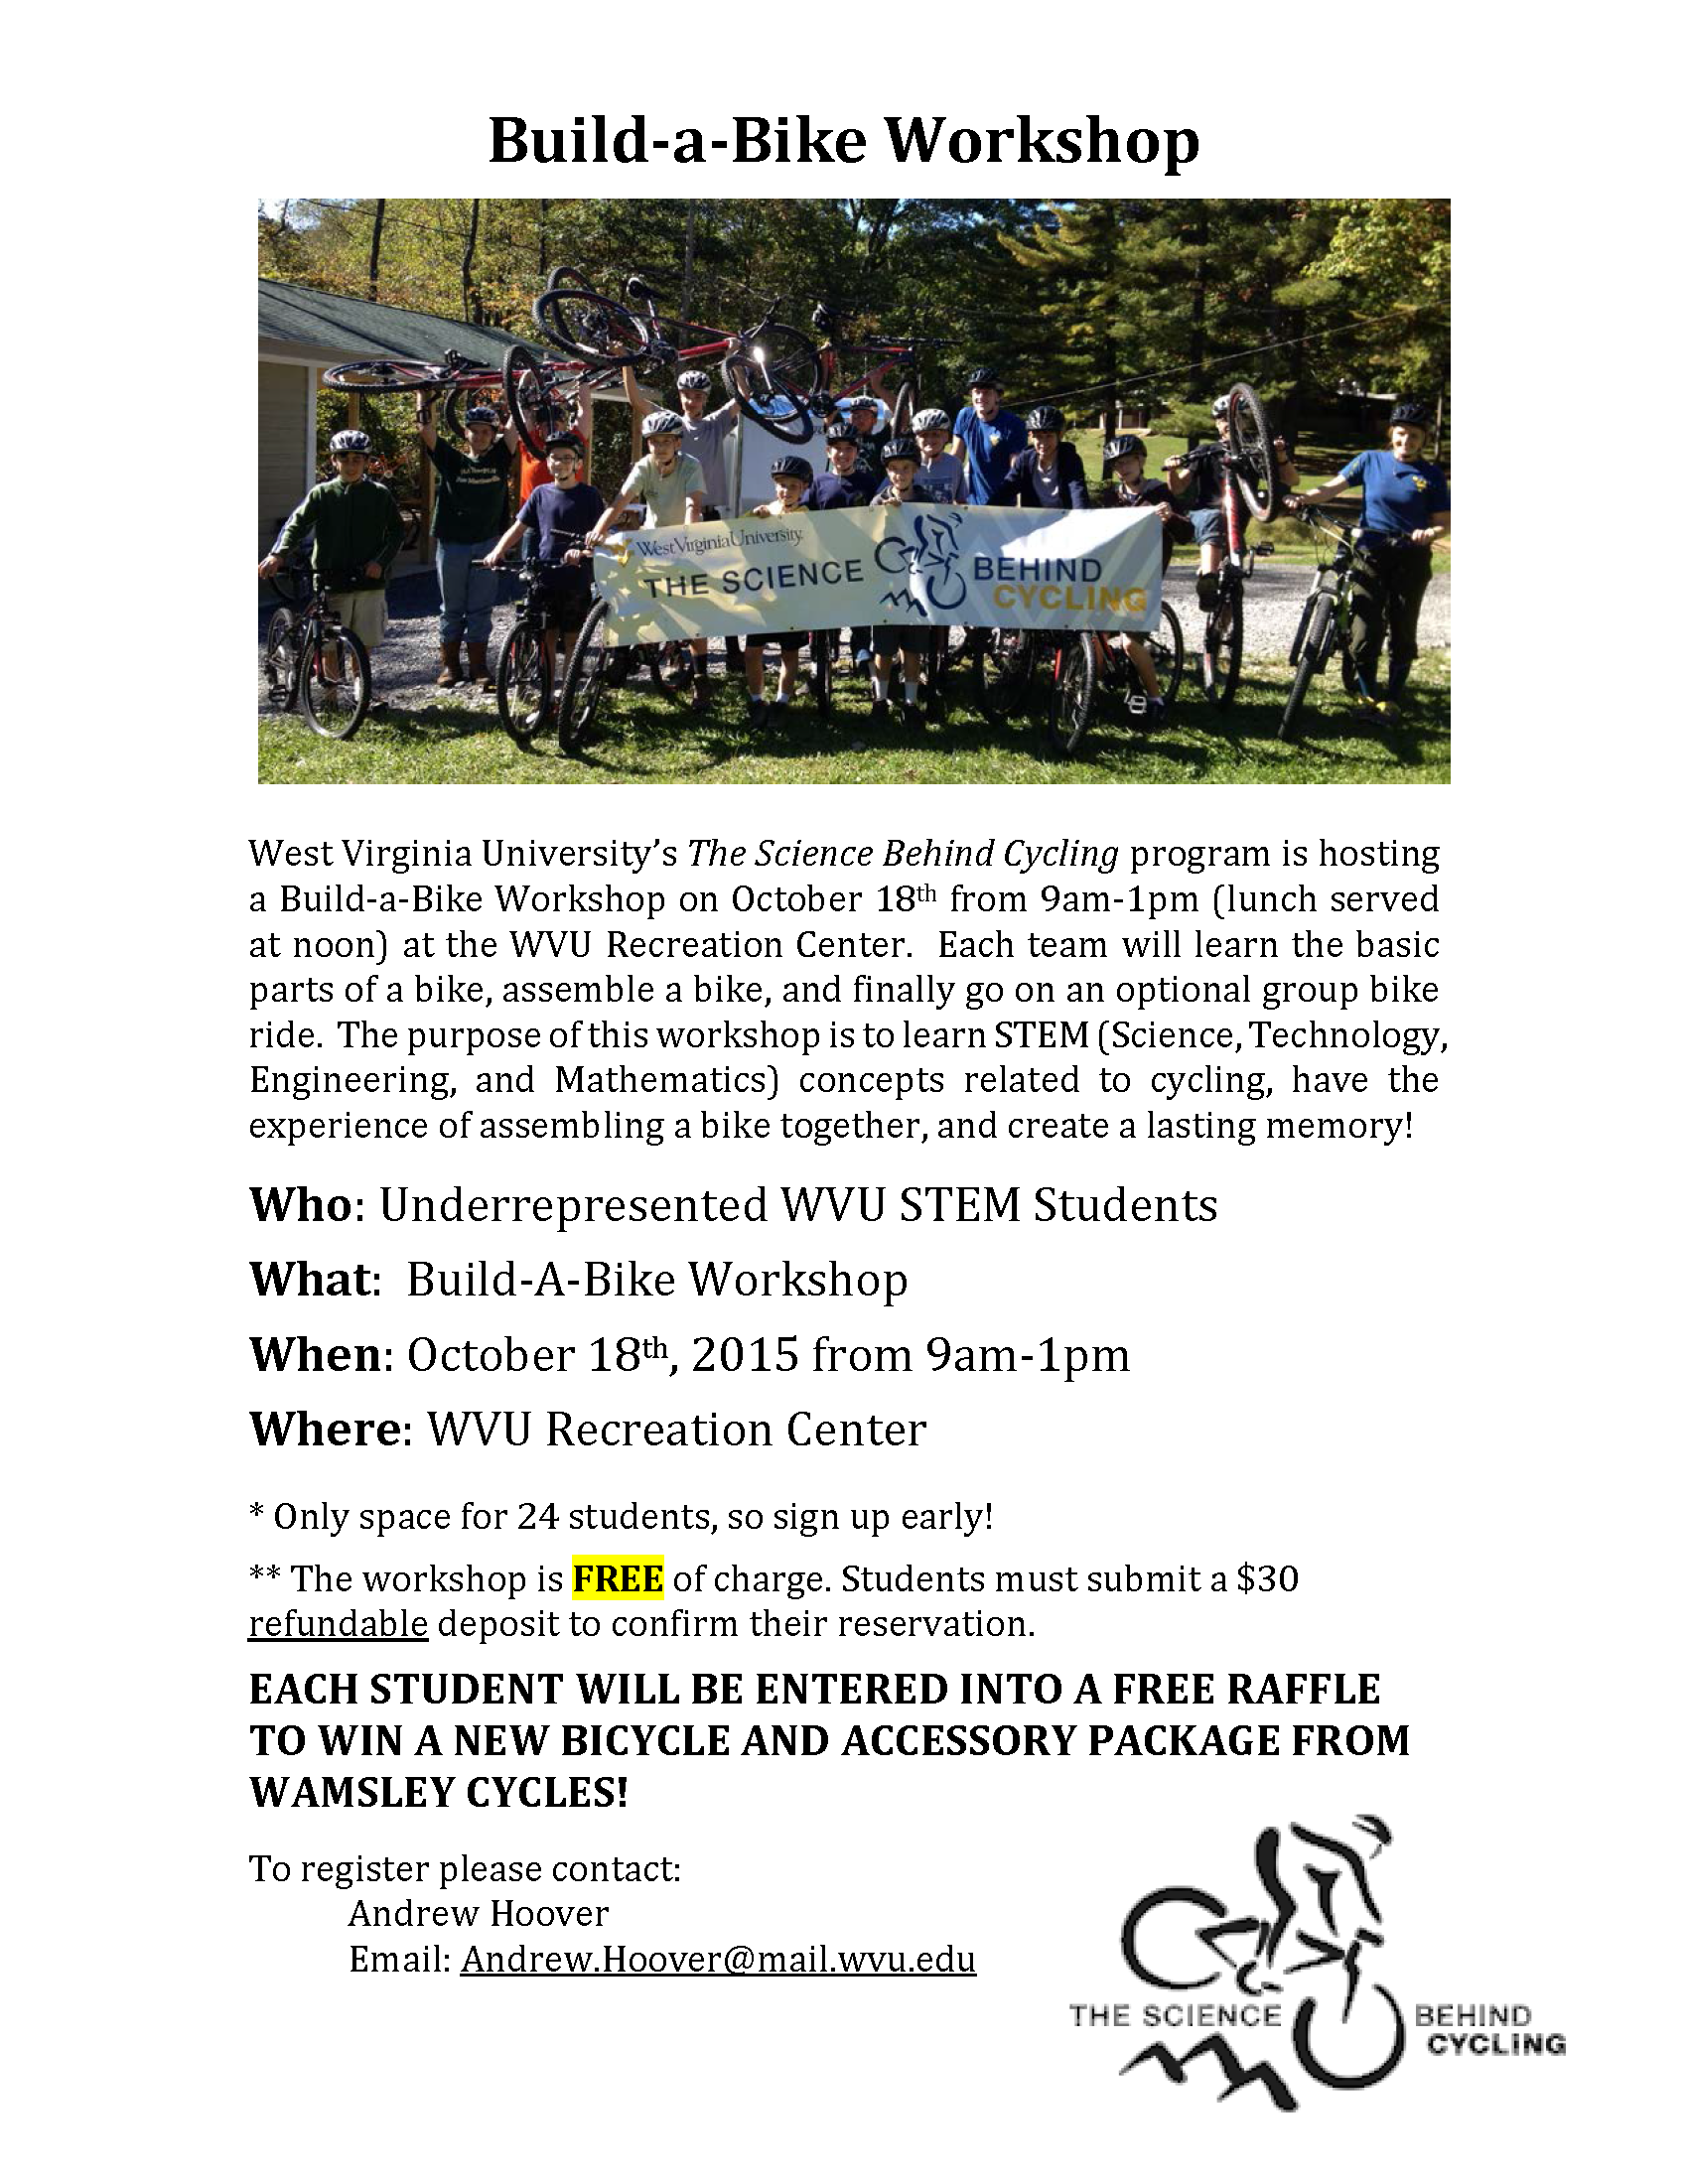 minority event flyer